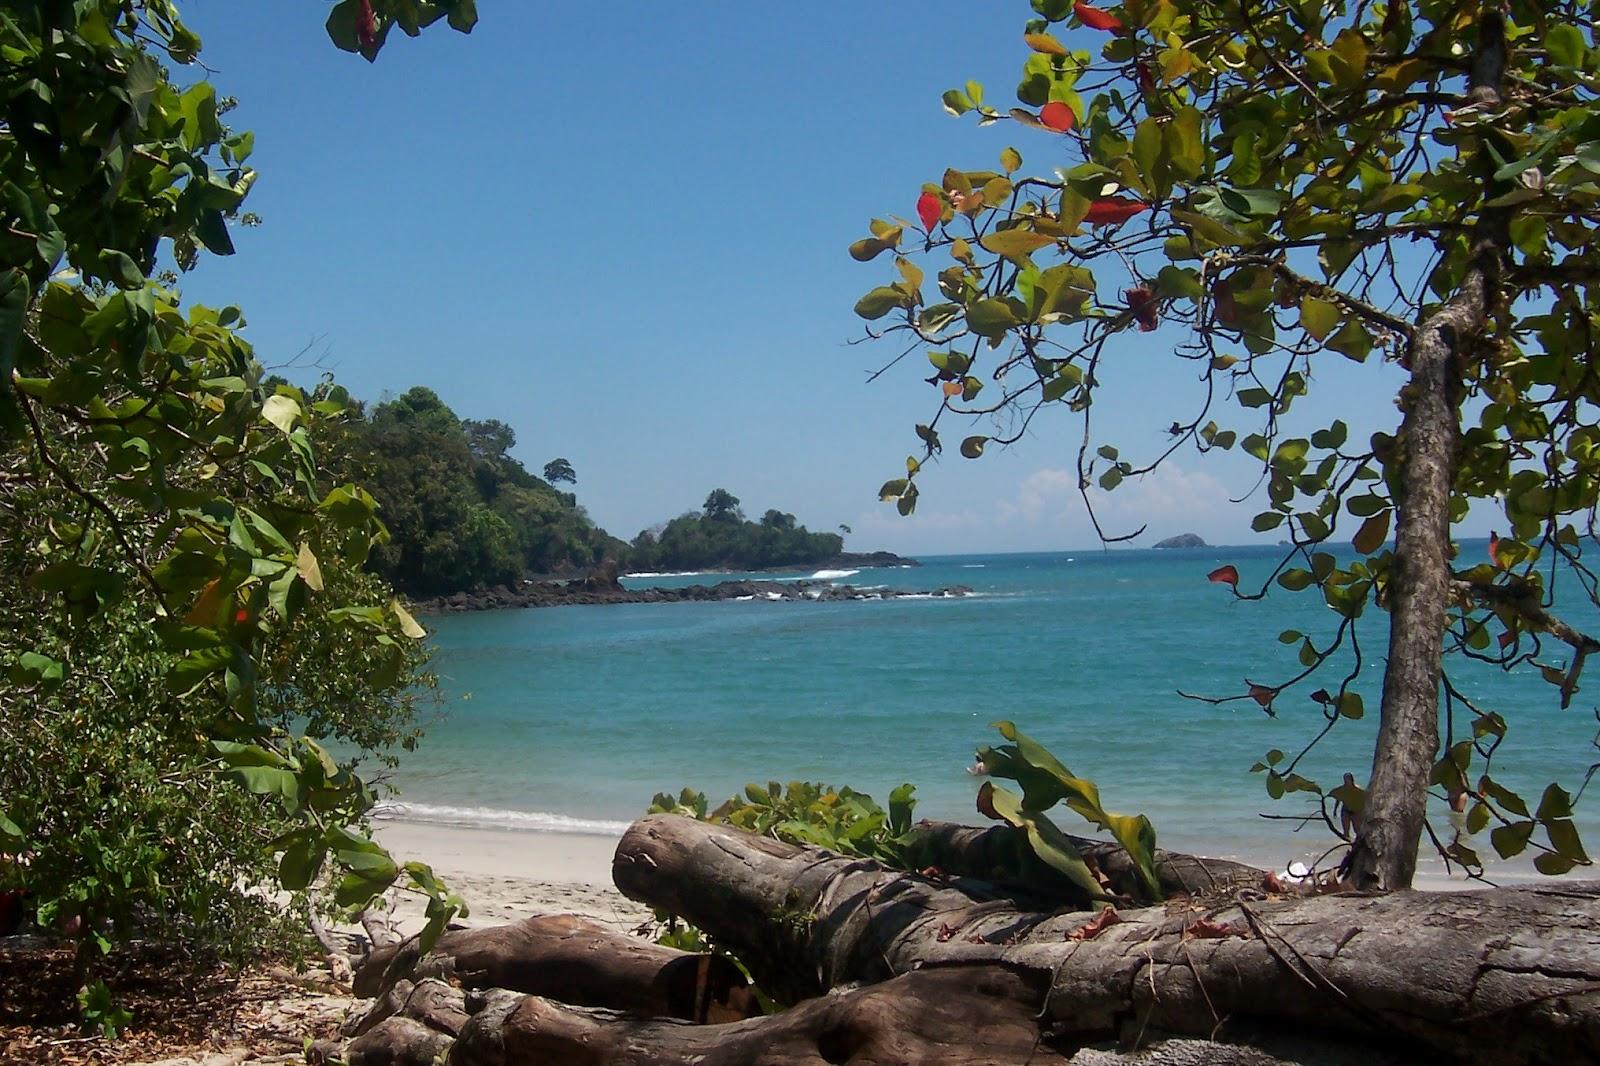 http://2.bp.blogspot.com/-ISW85EjBs-E/T8ytkMy6PFI/AAAAAAAABl4/7kABYjWPiKQ/s1600/Costa-Rica-Beaches.jpg